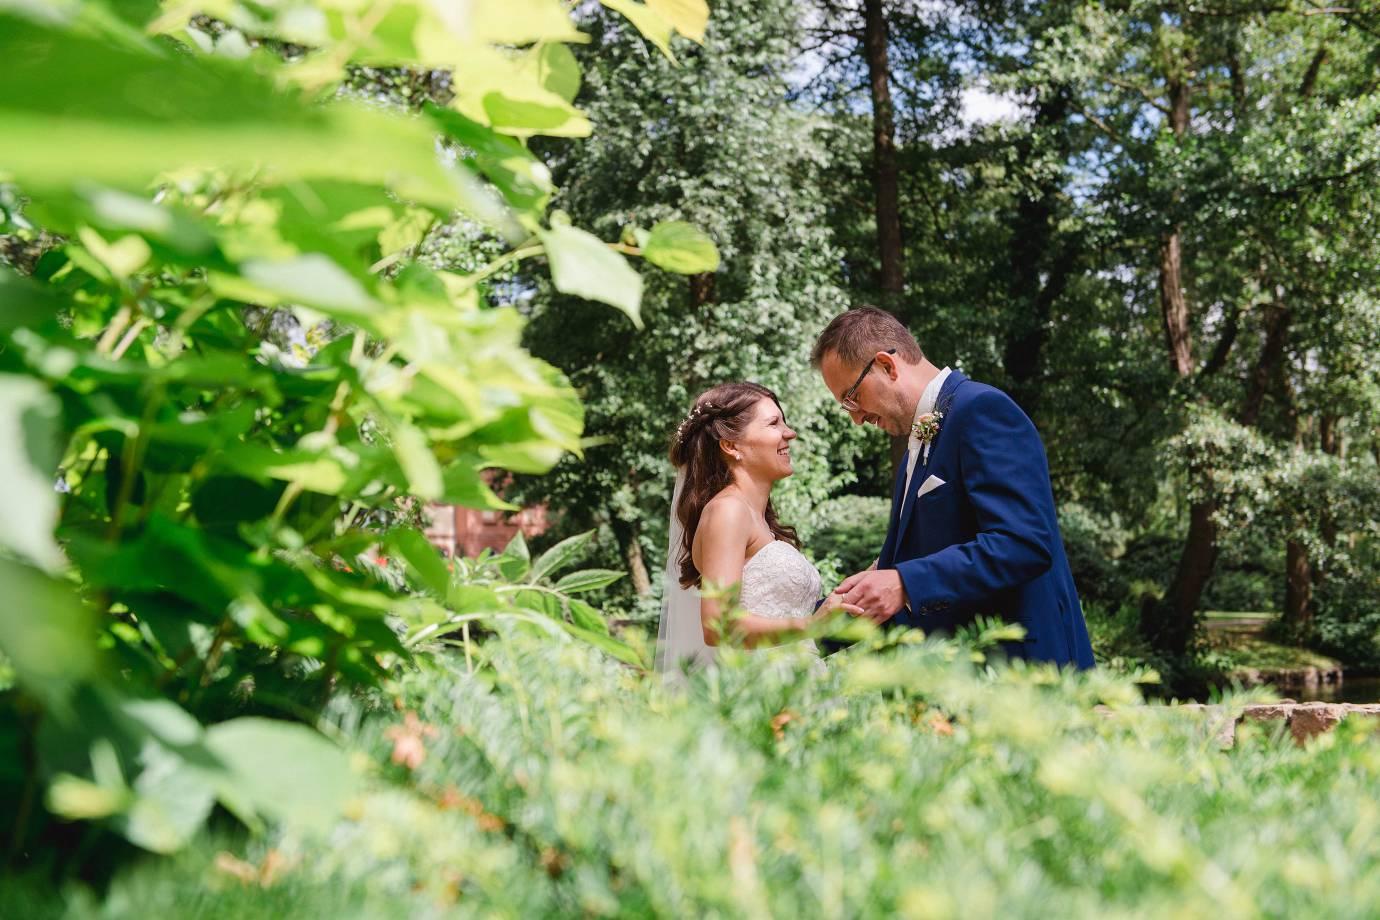 hochzeitsfotograf ganderkesee 031 - Christina+Andreas